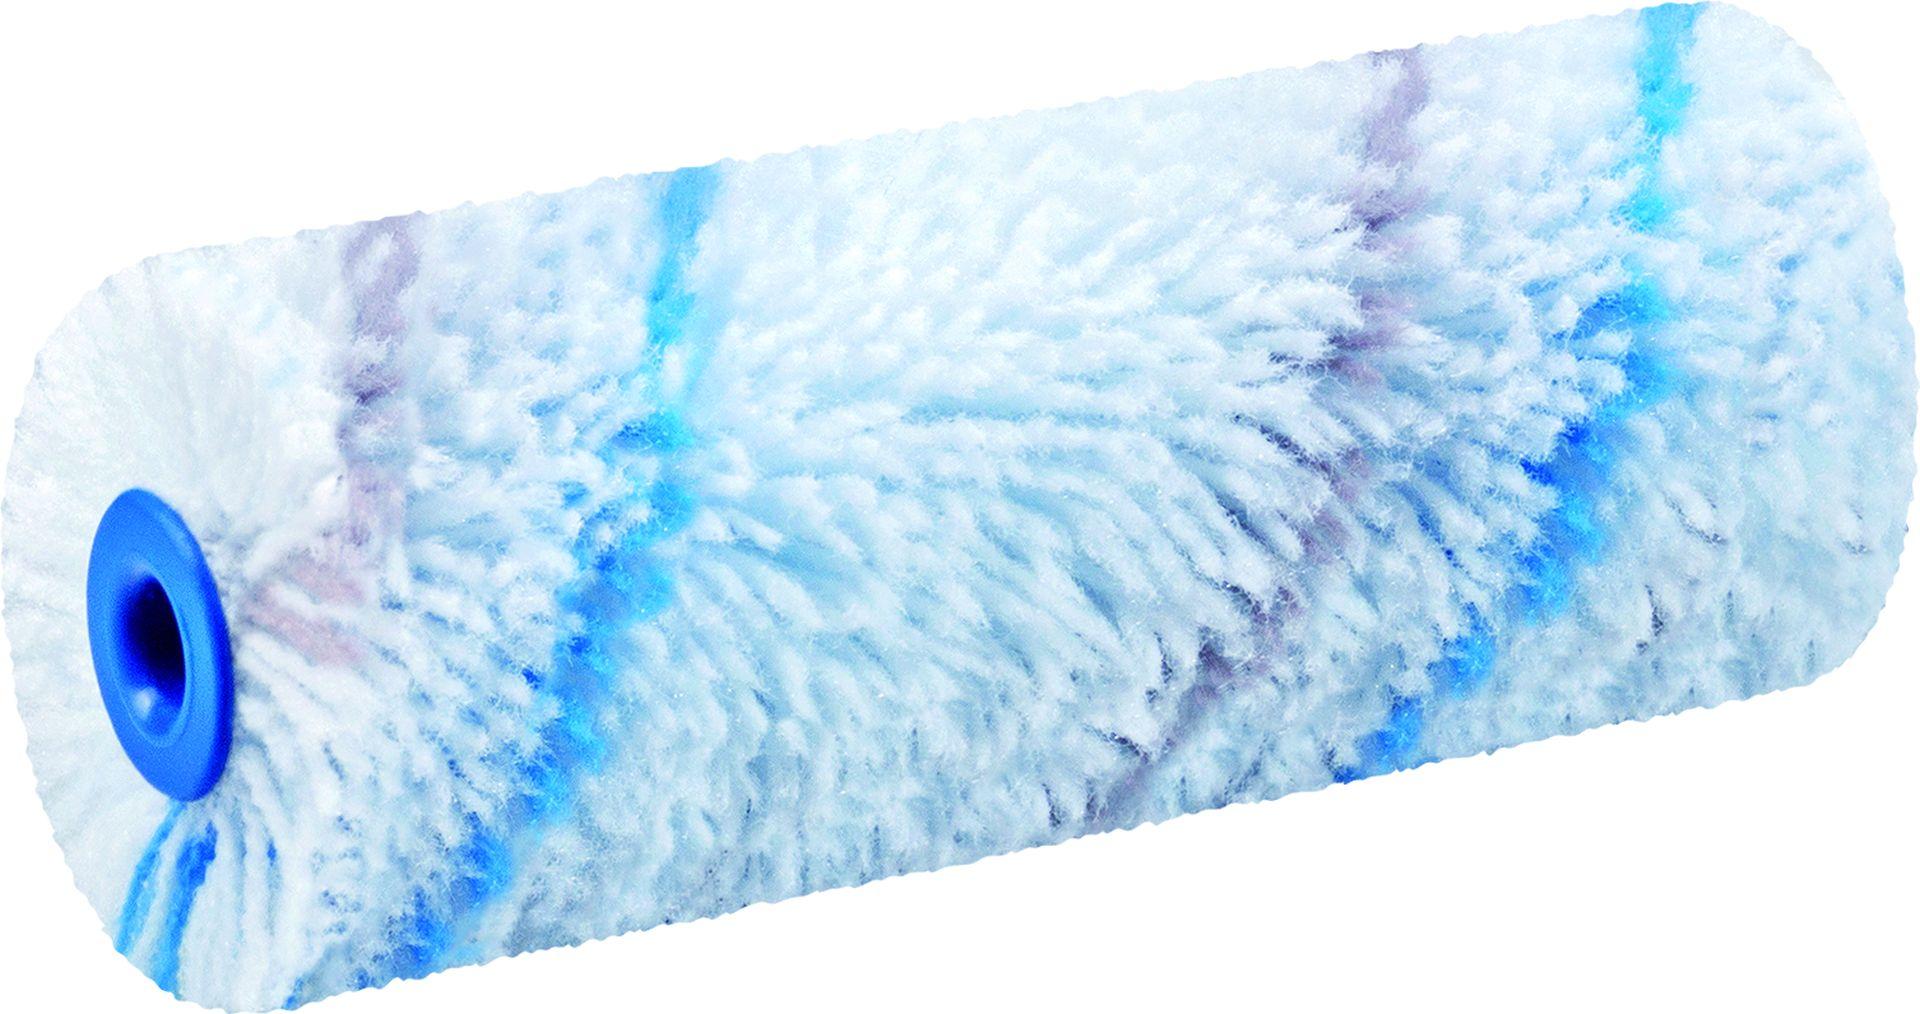 STORCH Walze, 10 cm, im 2er Pack, K16 Polyamid 12 Multicolor Blaugraufaden